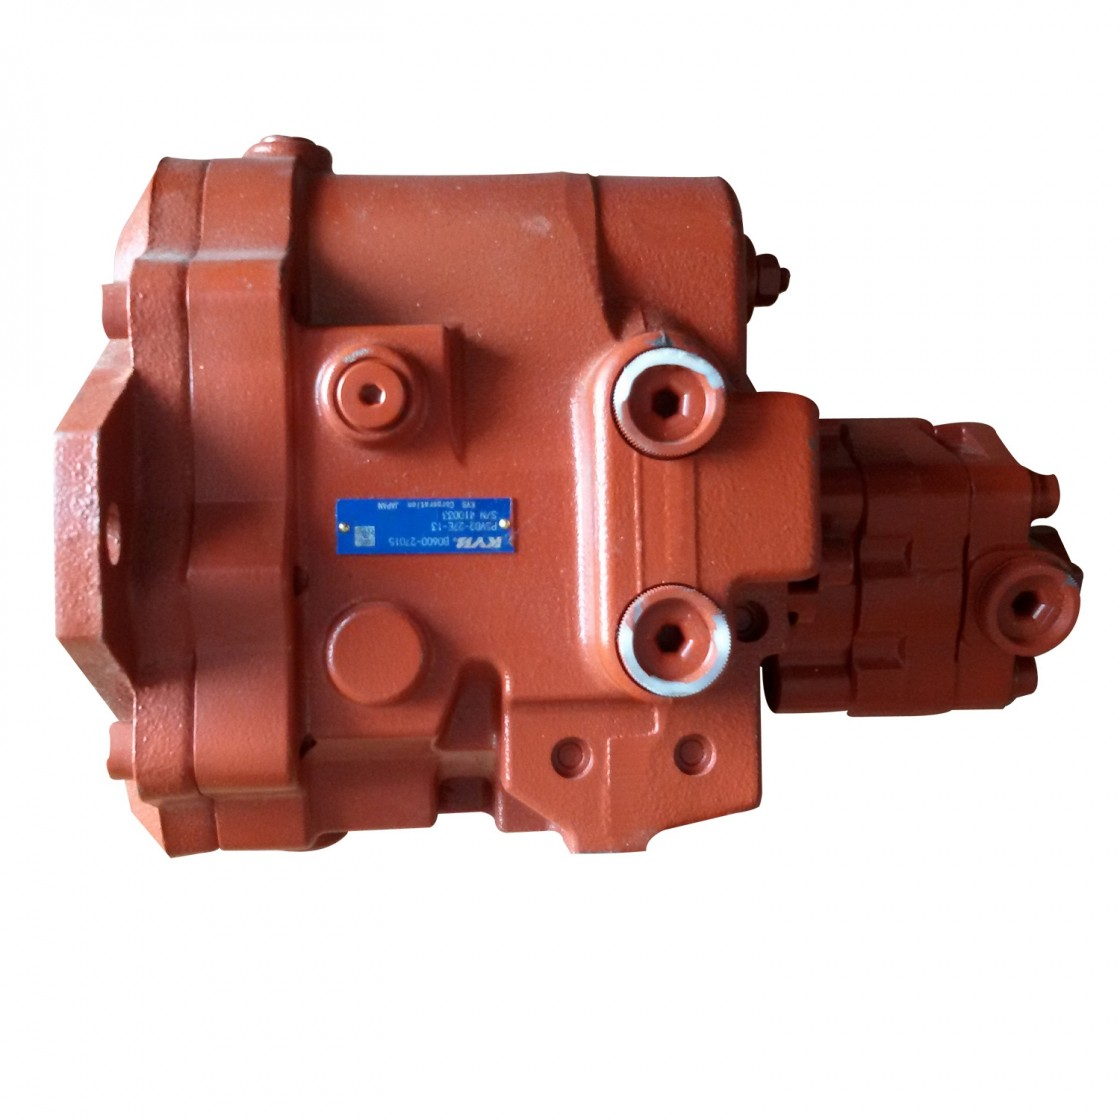 NACHI PVS-1B-22N0-12 PVS Series Variable Volume Piston Pumps